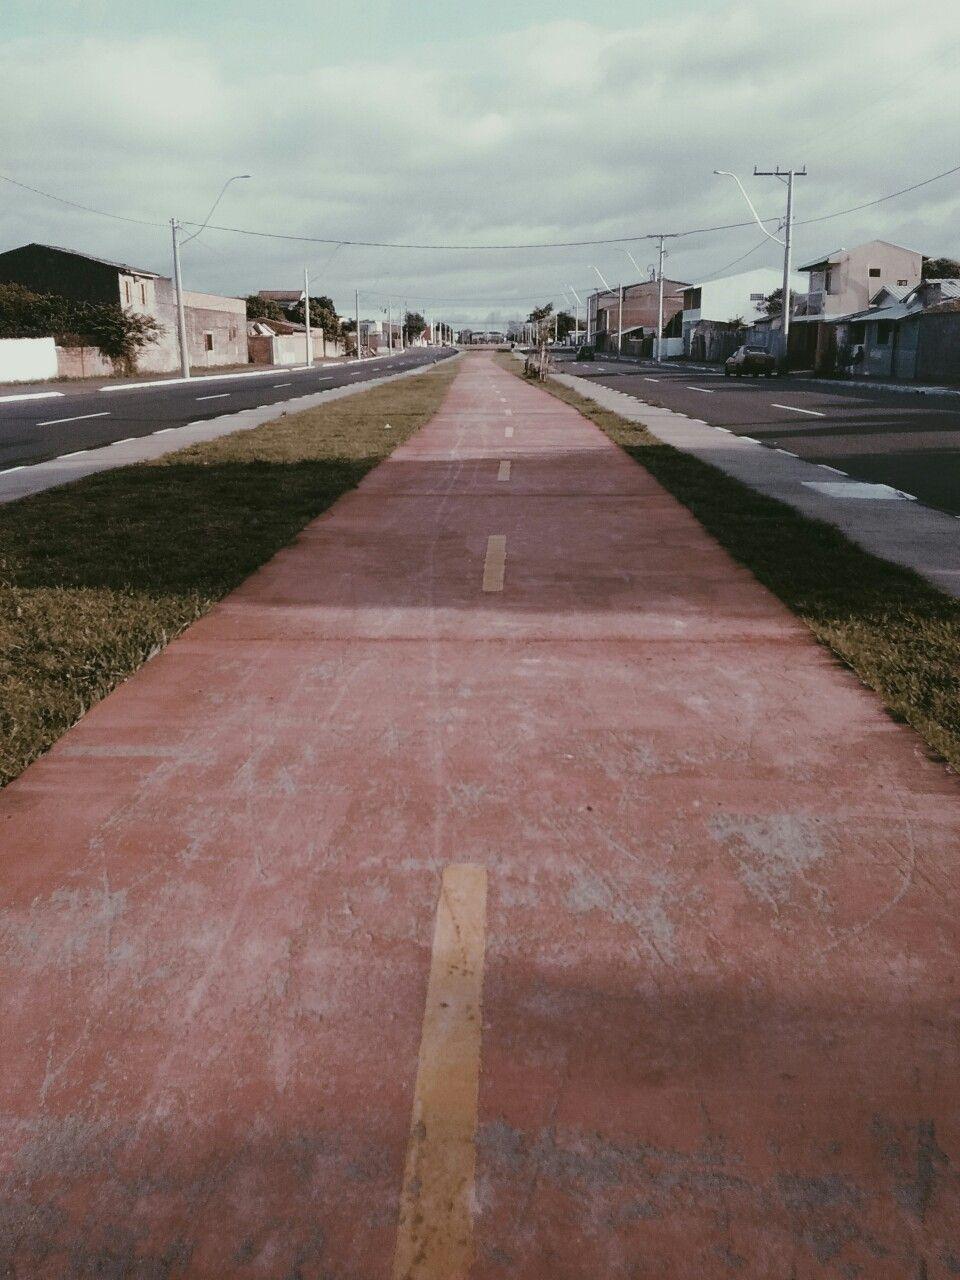 Instagram: machado_dai